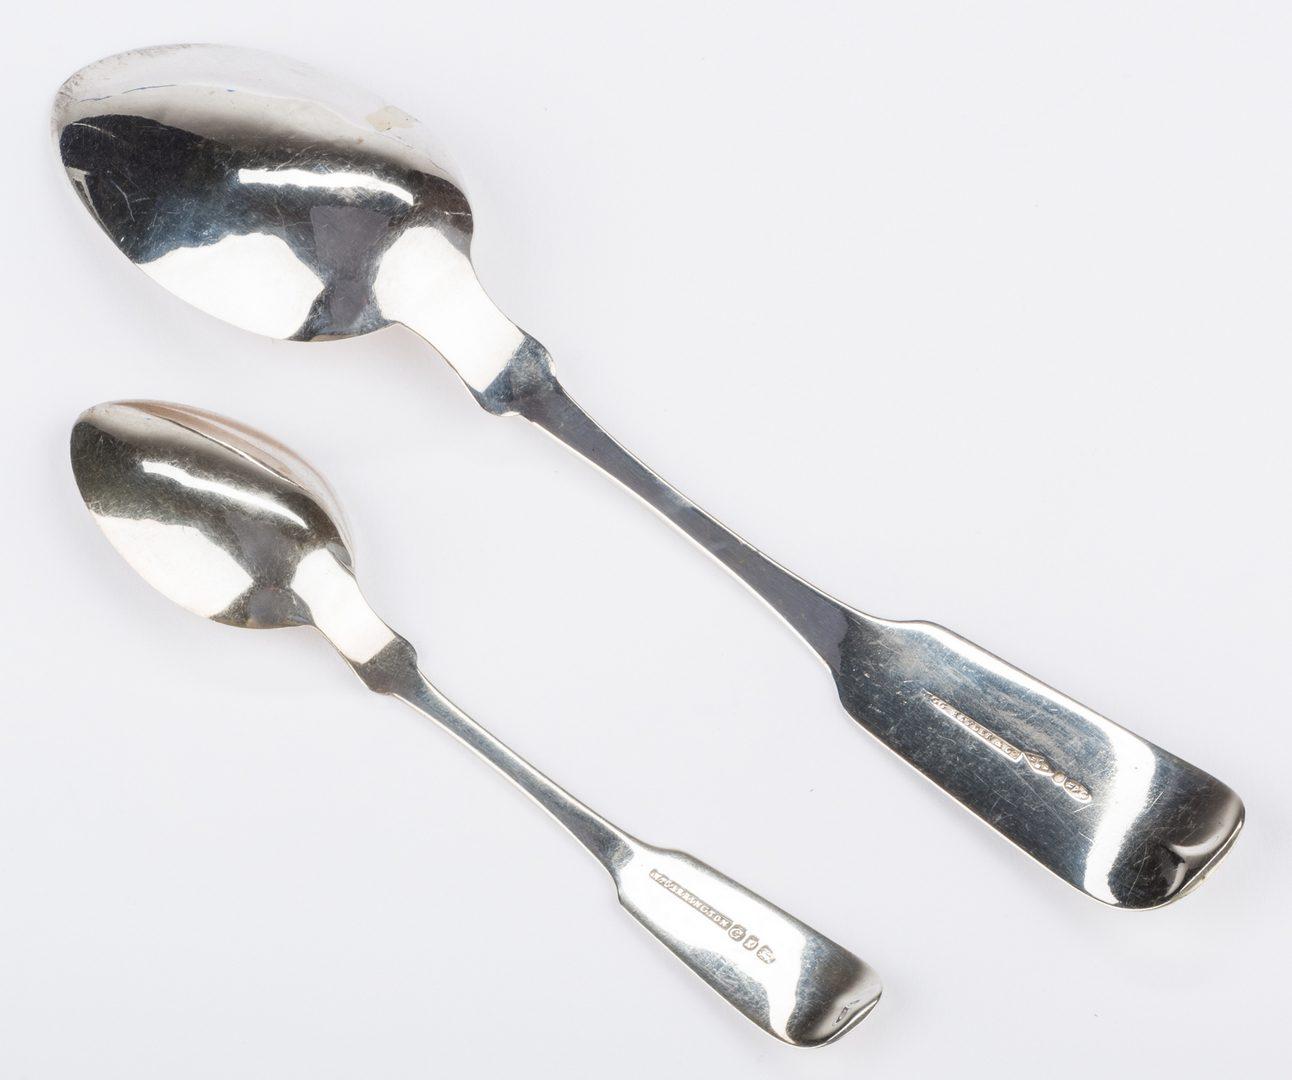 Lot 279: Ewan S. Carolina Coin Silver Tongs plus 2 spoons